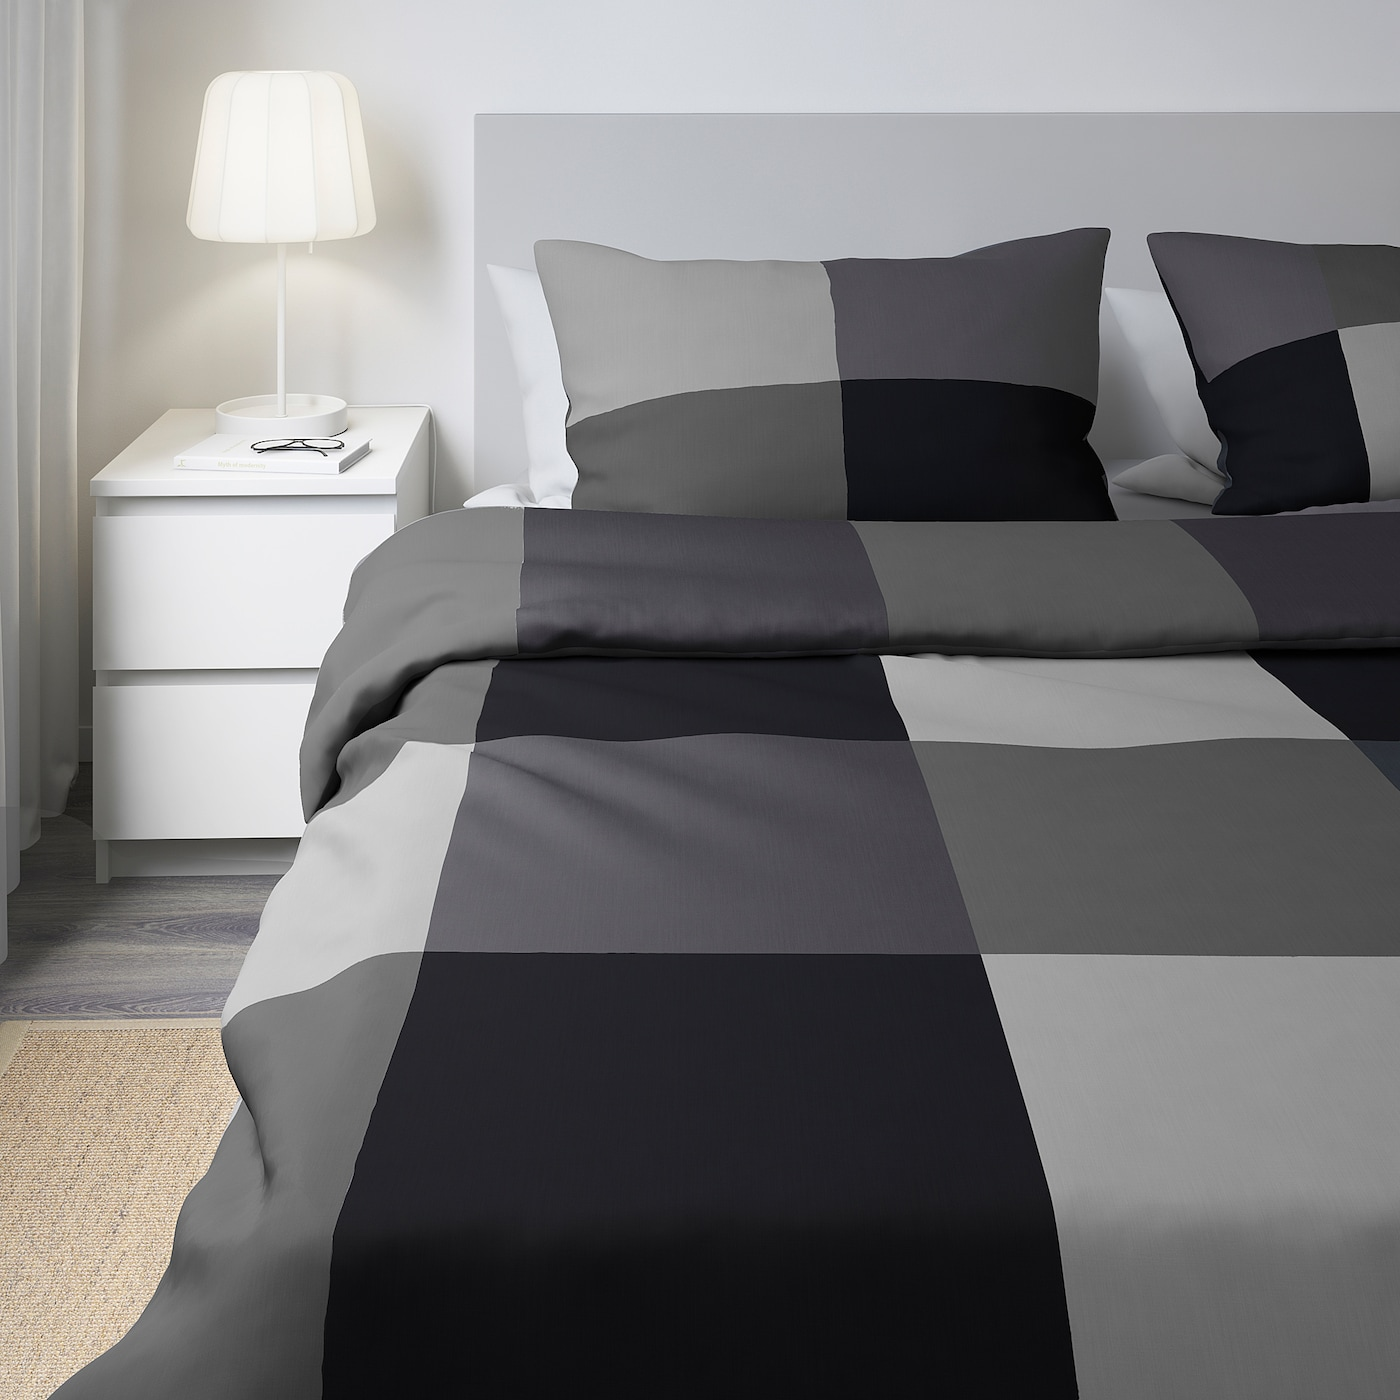 BRUNKRISSLA quilt cover and 2 pillowcases black 152 /inch² 2 pack 200 cm 200 cm 50 cm 80 cm